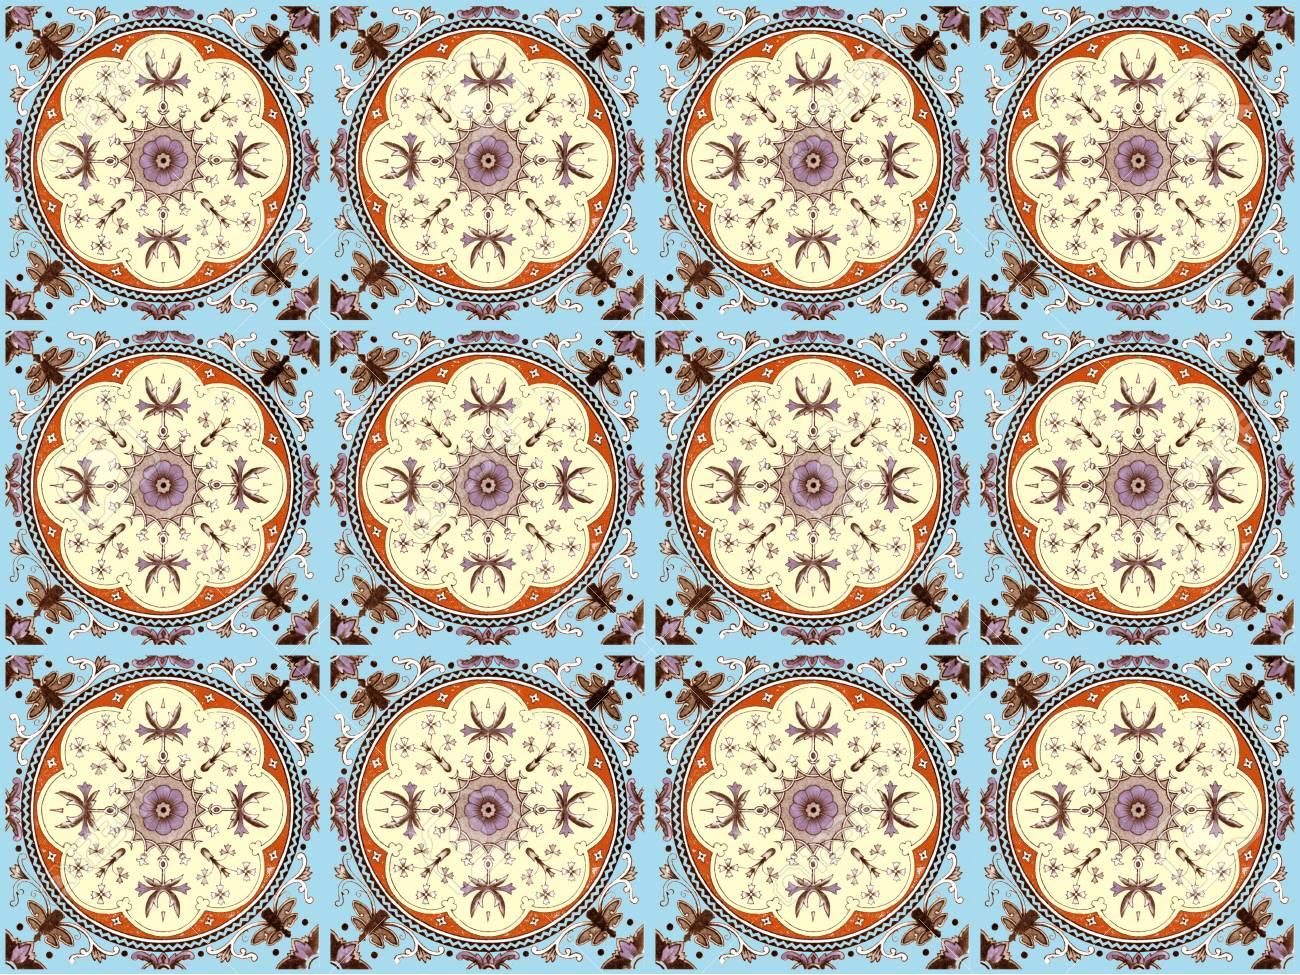 Moroccan Tile Pattern Background.Colorful Vintage Ceramic Tiles ...